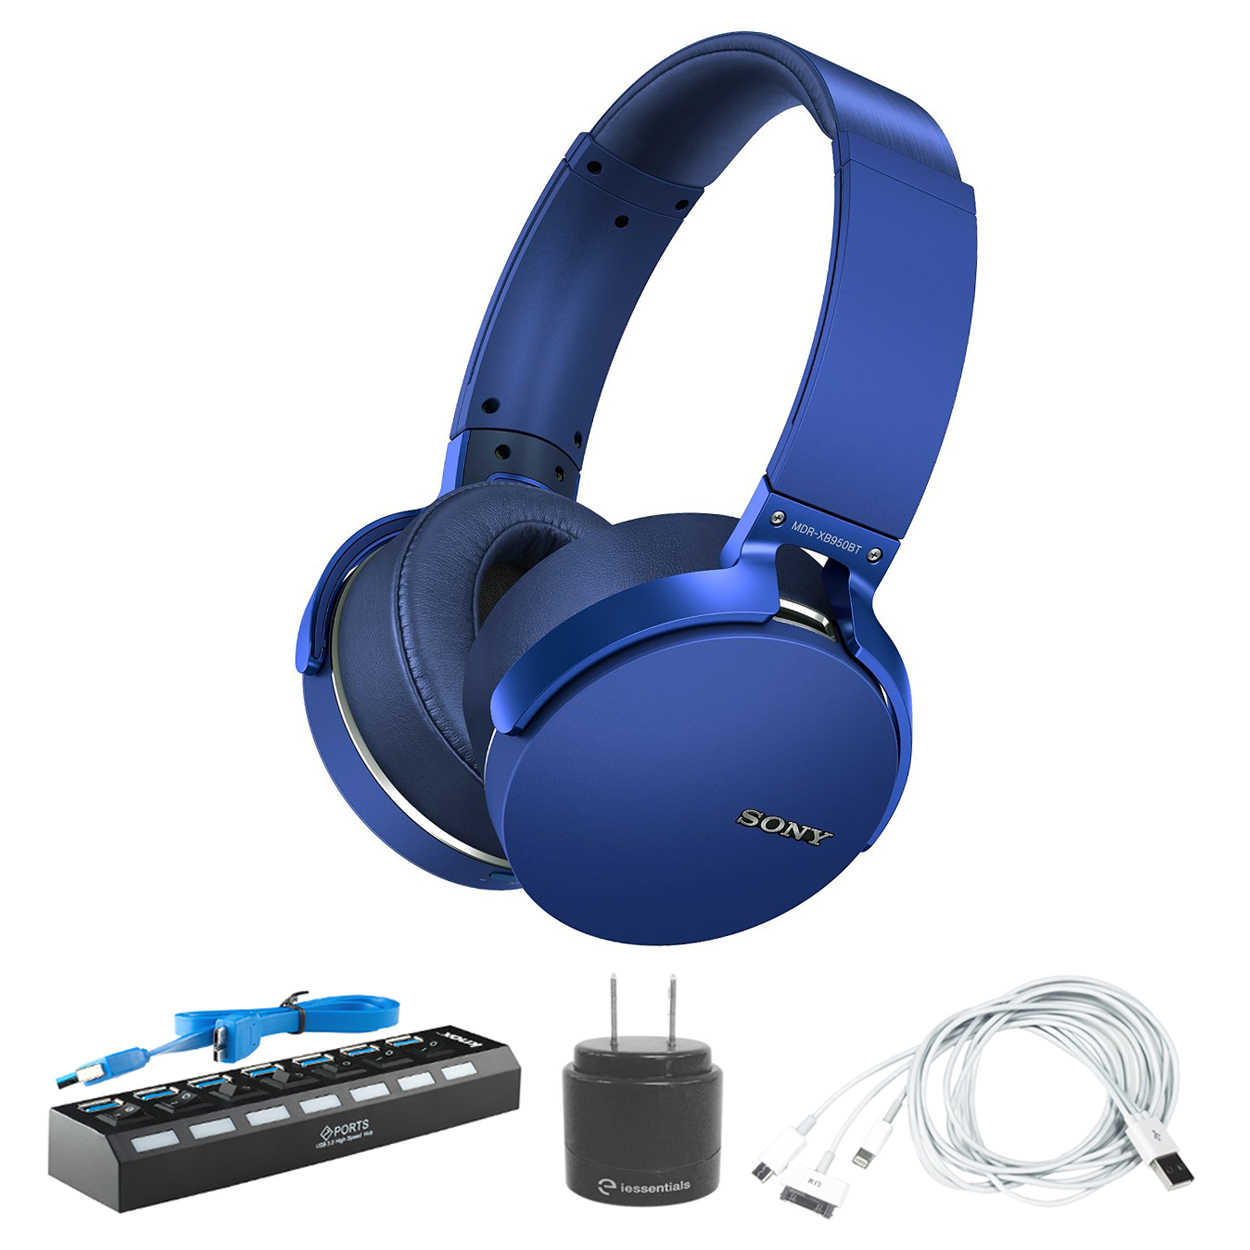 Sony Extra Bass Bluetooth Headphones (Blue) with 7-Port USB 3.0 Hub & Accessory Bundle